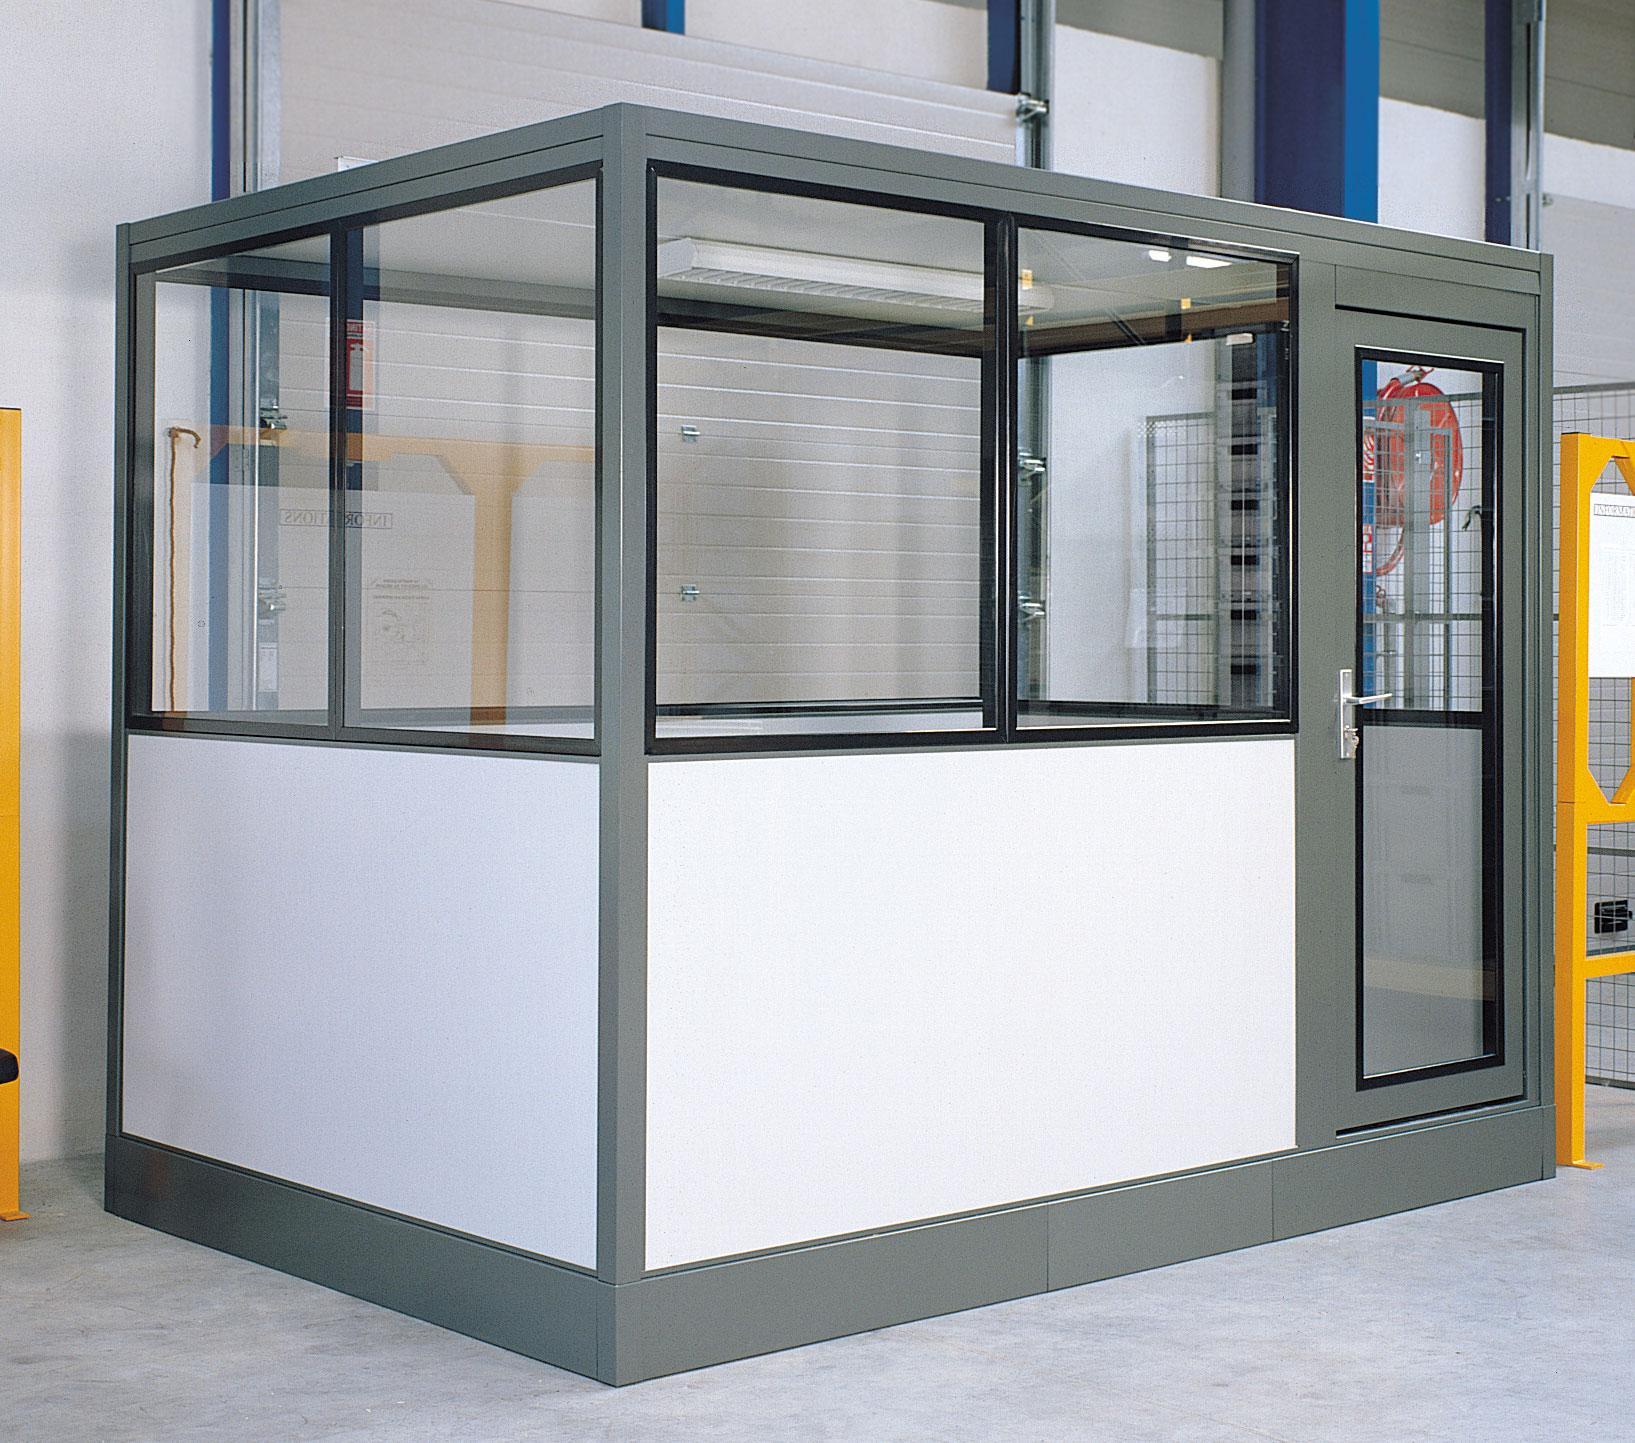 Bureau cabine d'atelier 3x2 mètres